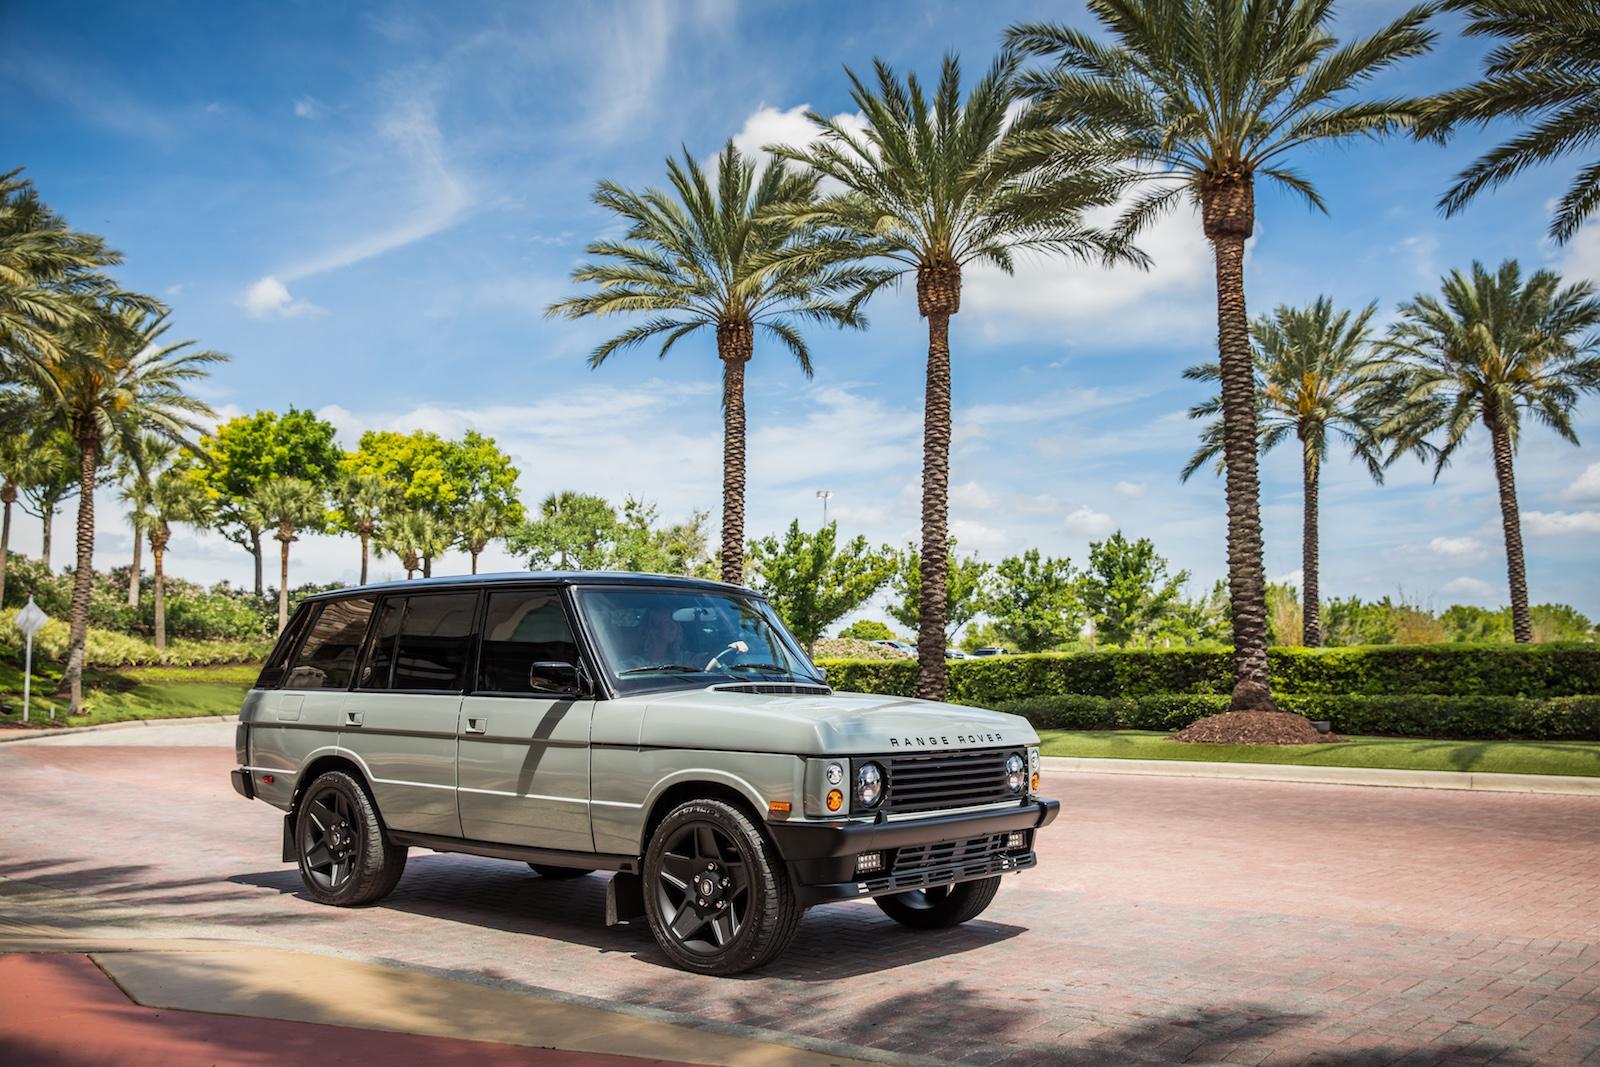 A Regal Raging Range Rover Restomod